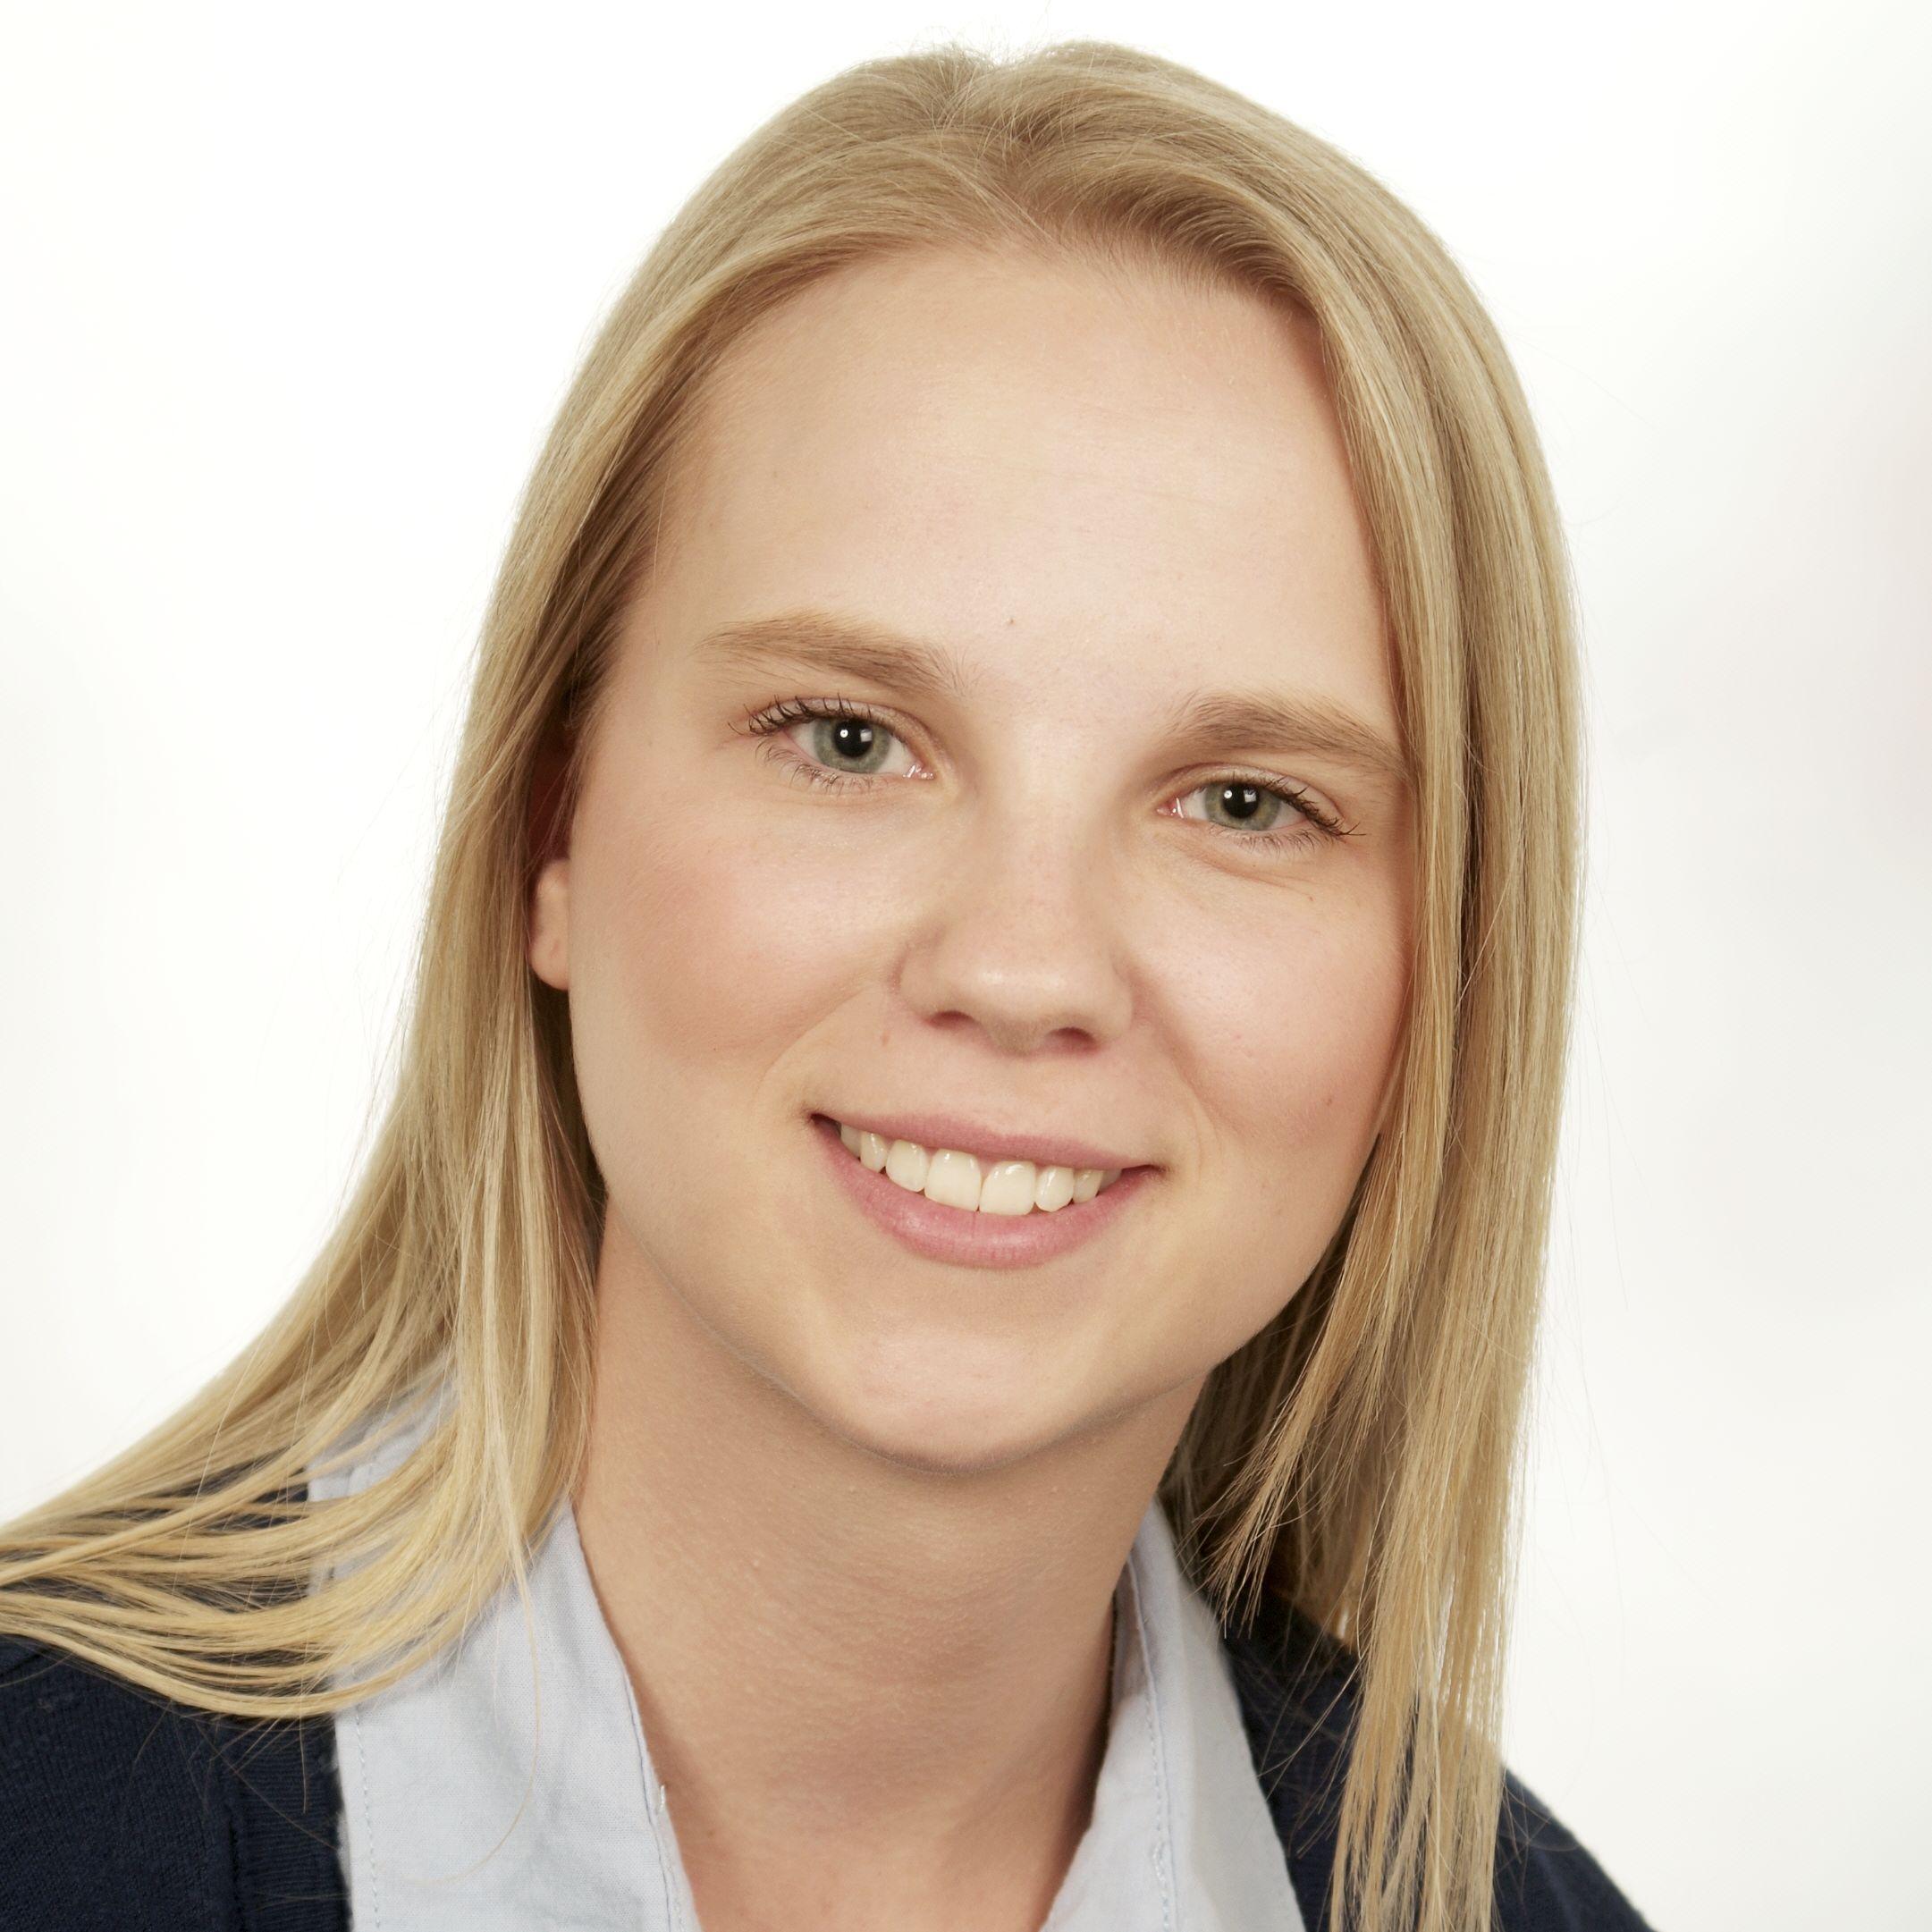 Annika Wiemers